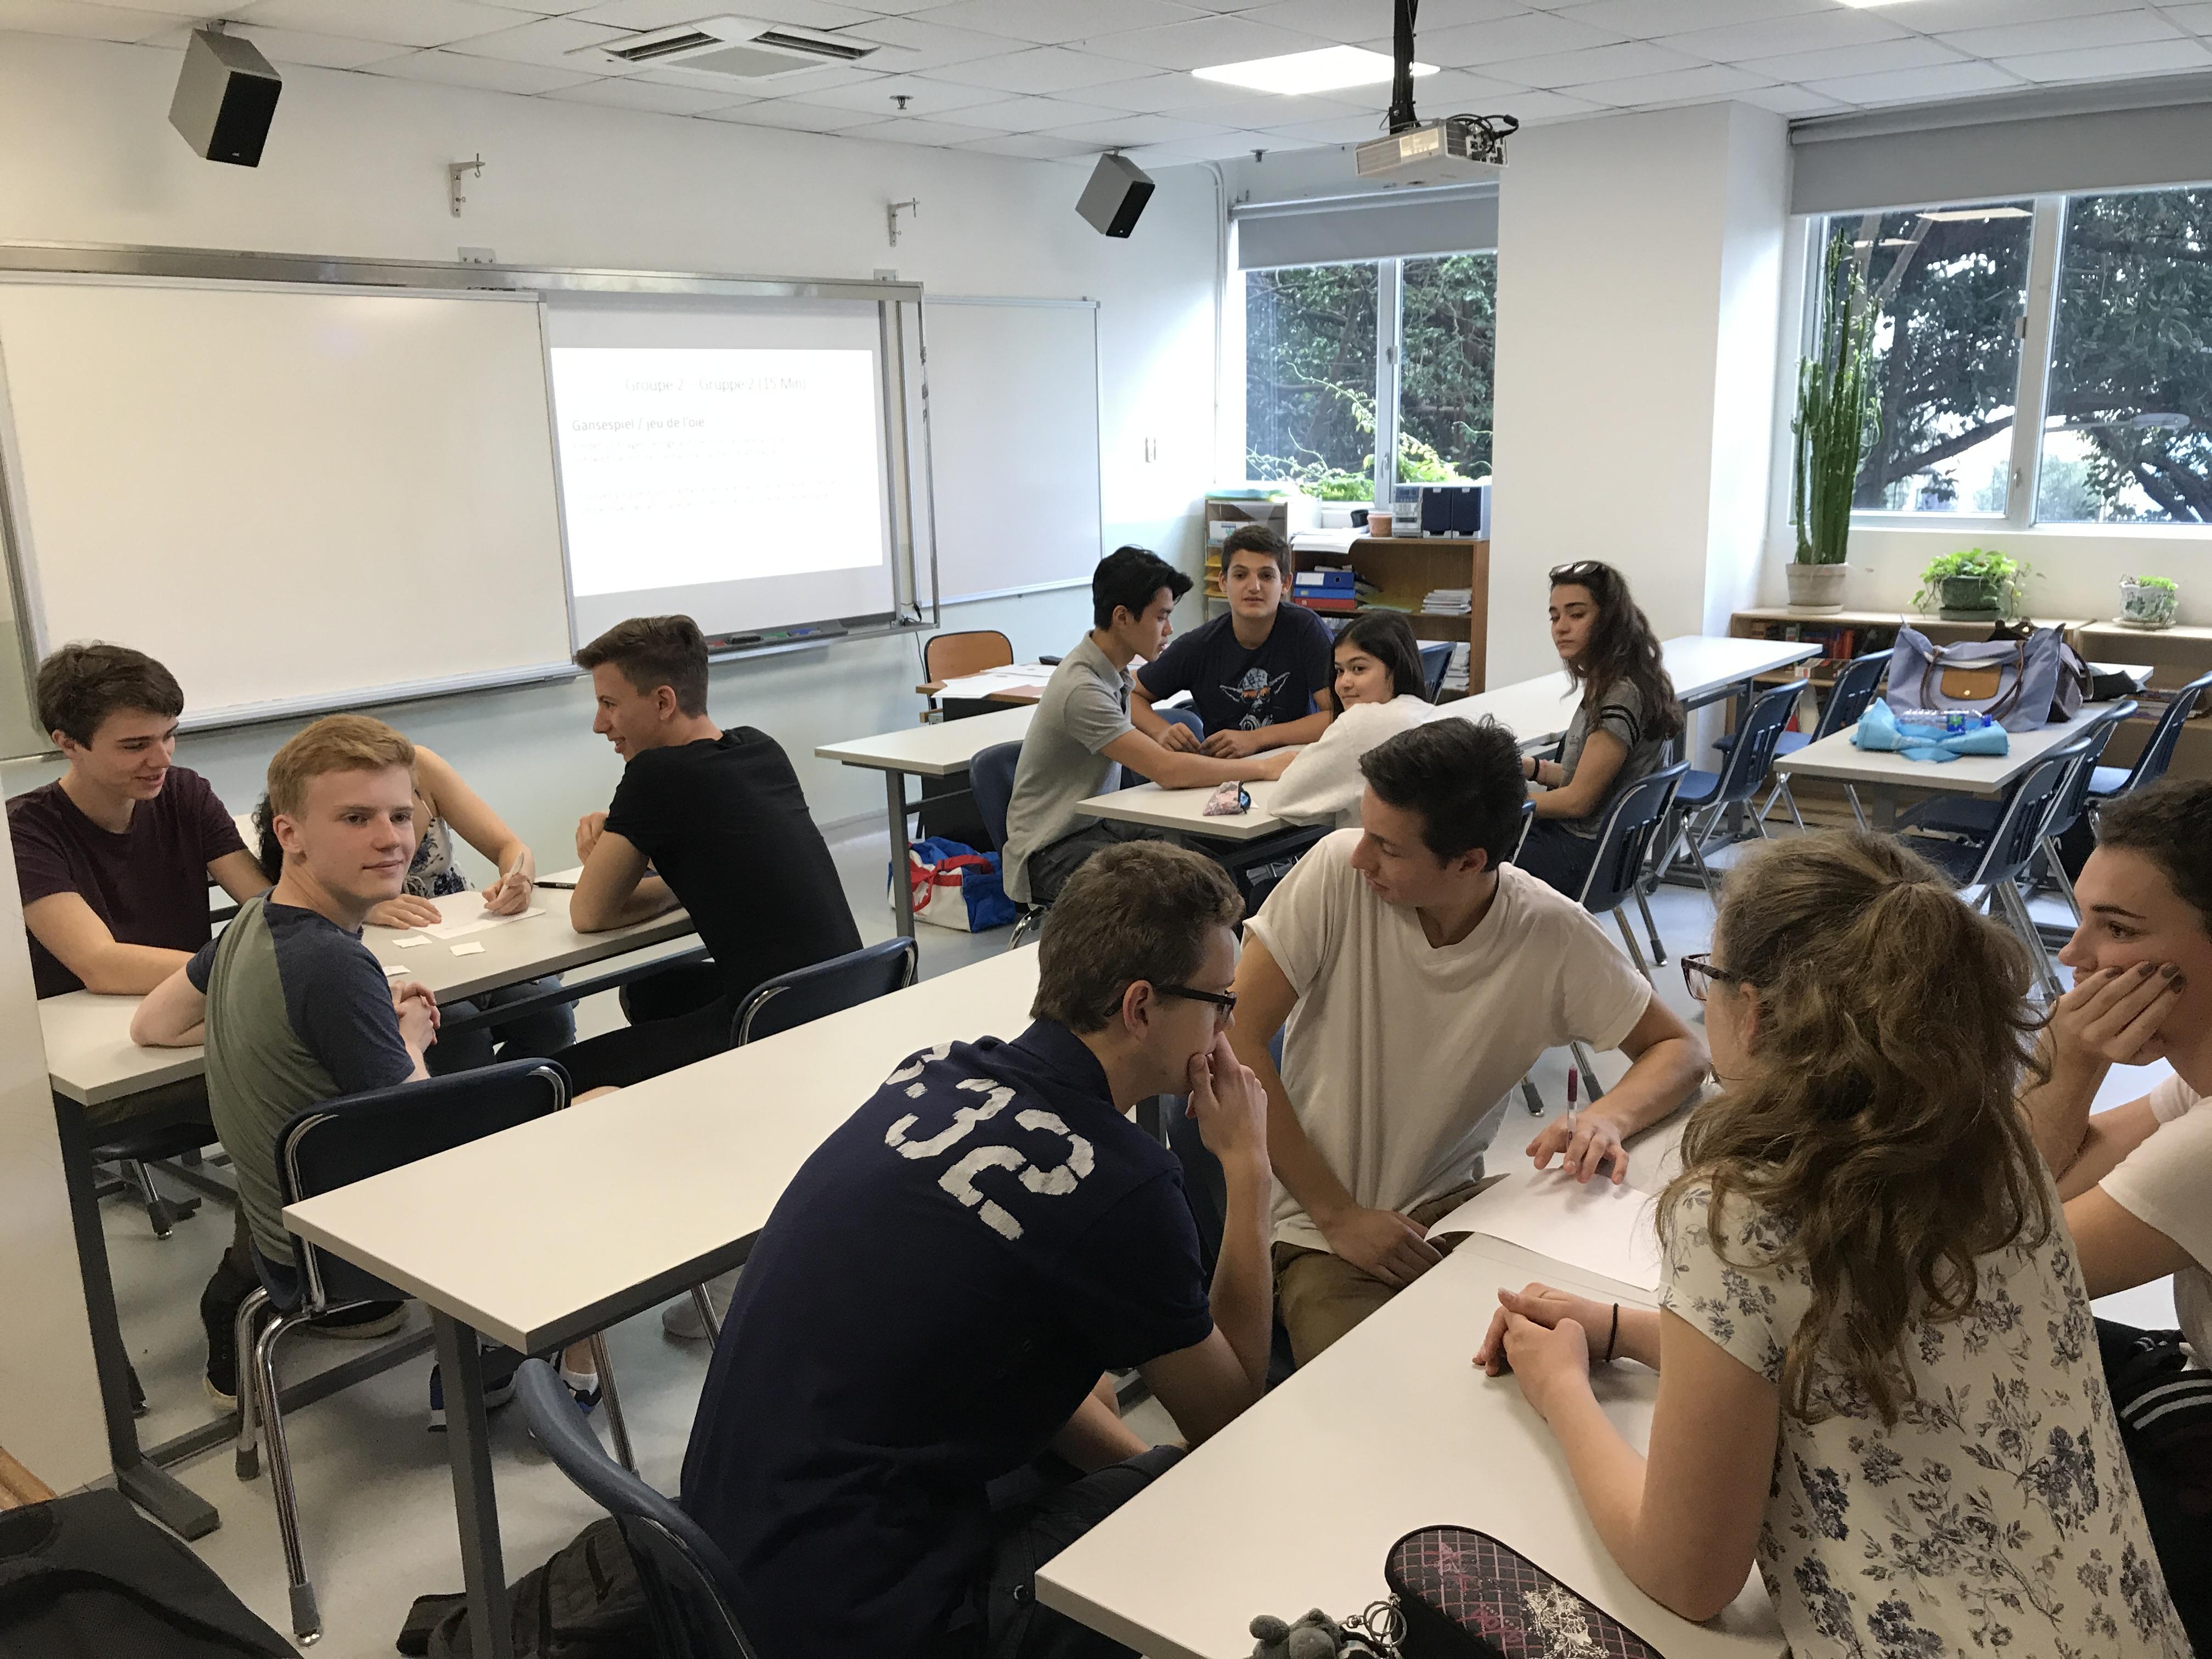 En groupe mixed, nous avons dressé un questionnaire pour un jeu franco-allemand. / Working in mixed groups: students create a questionnaire for a French-German game.